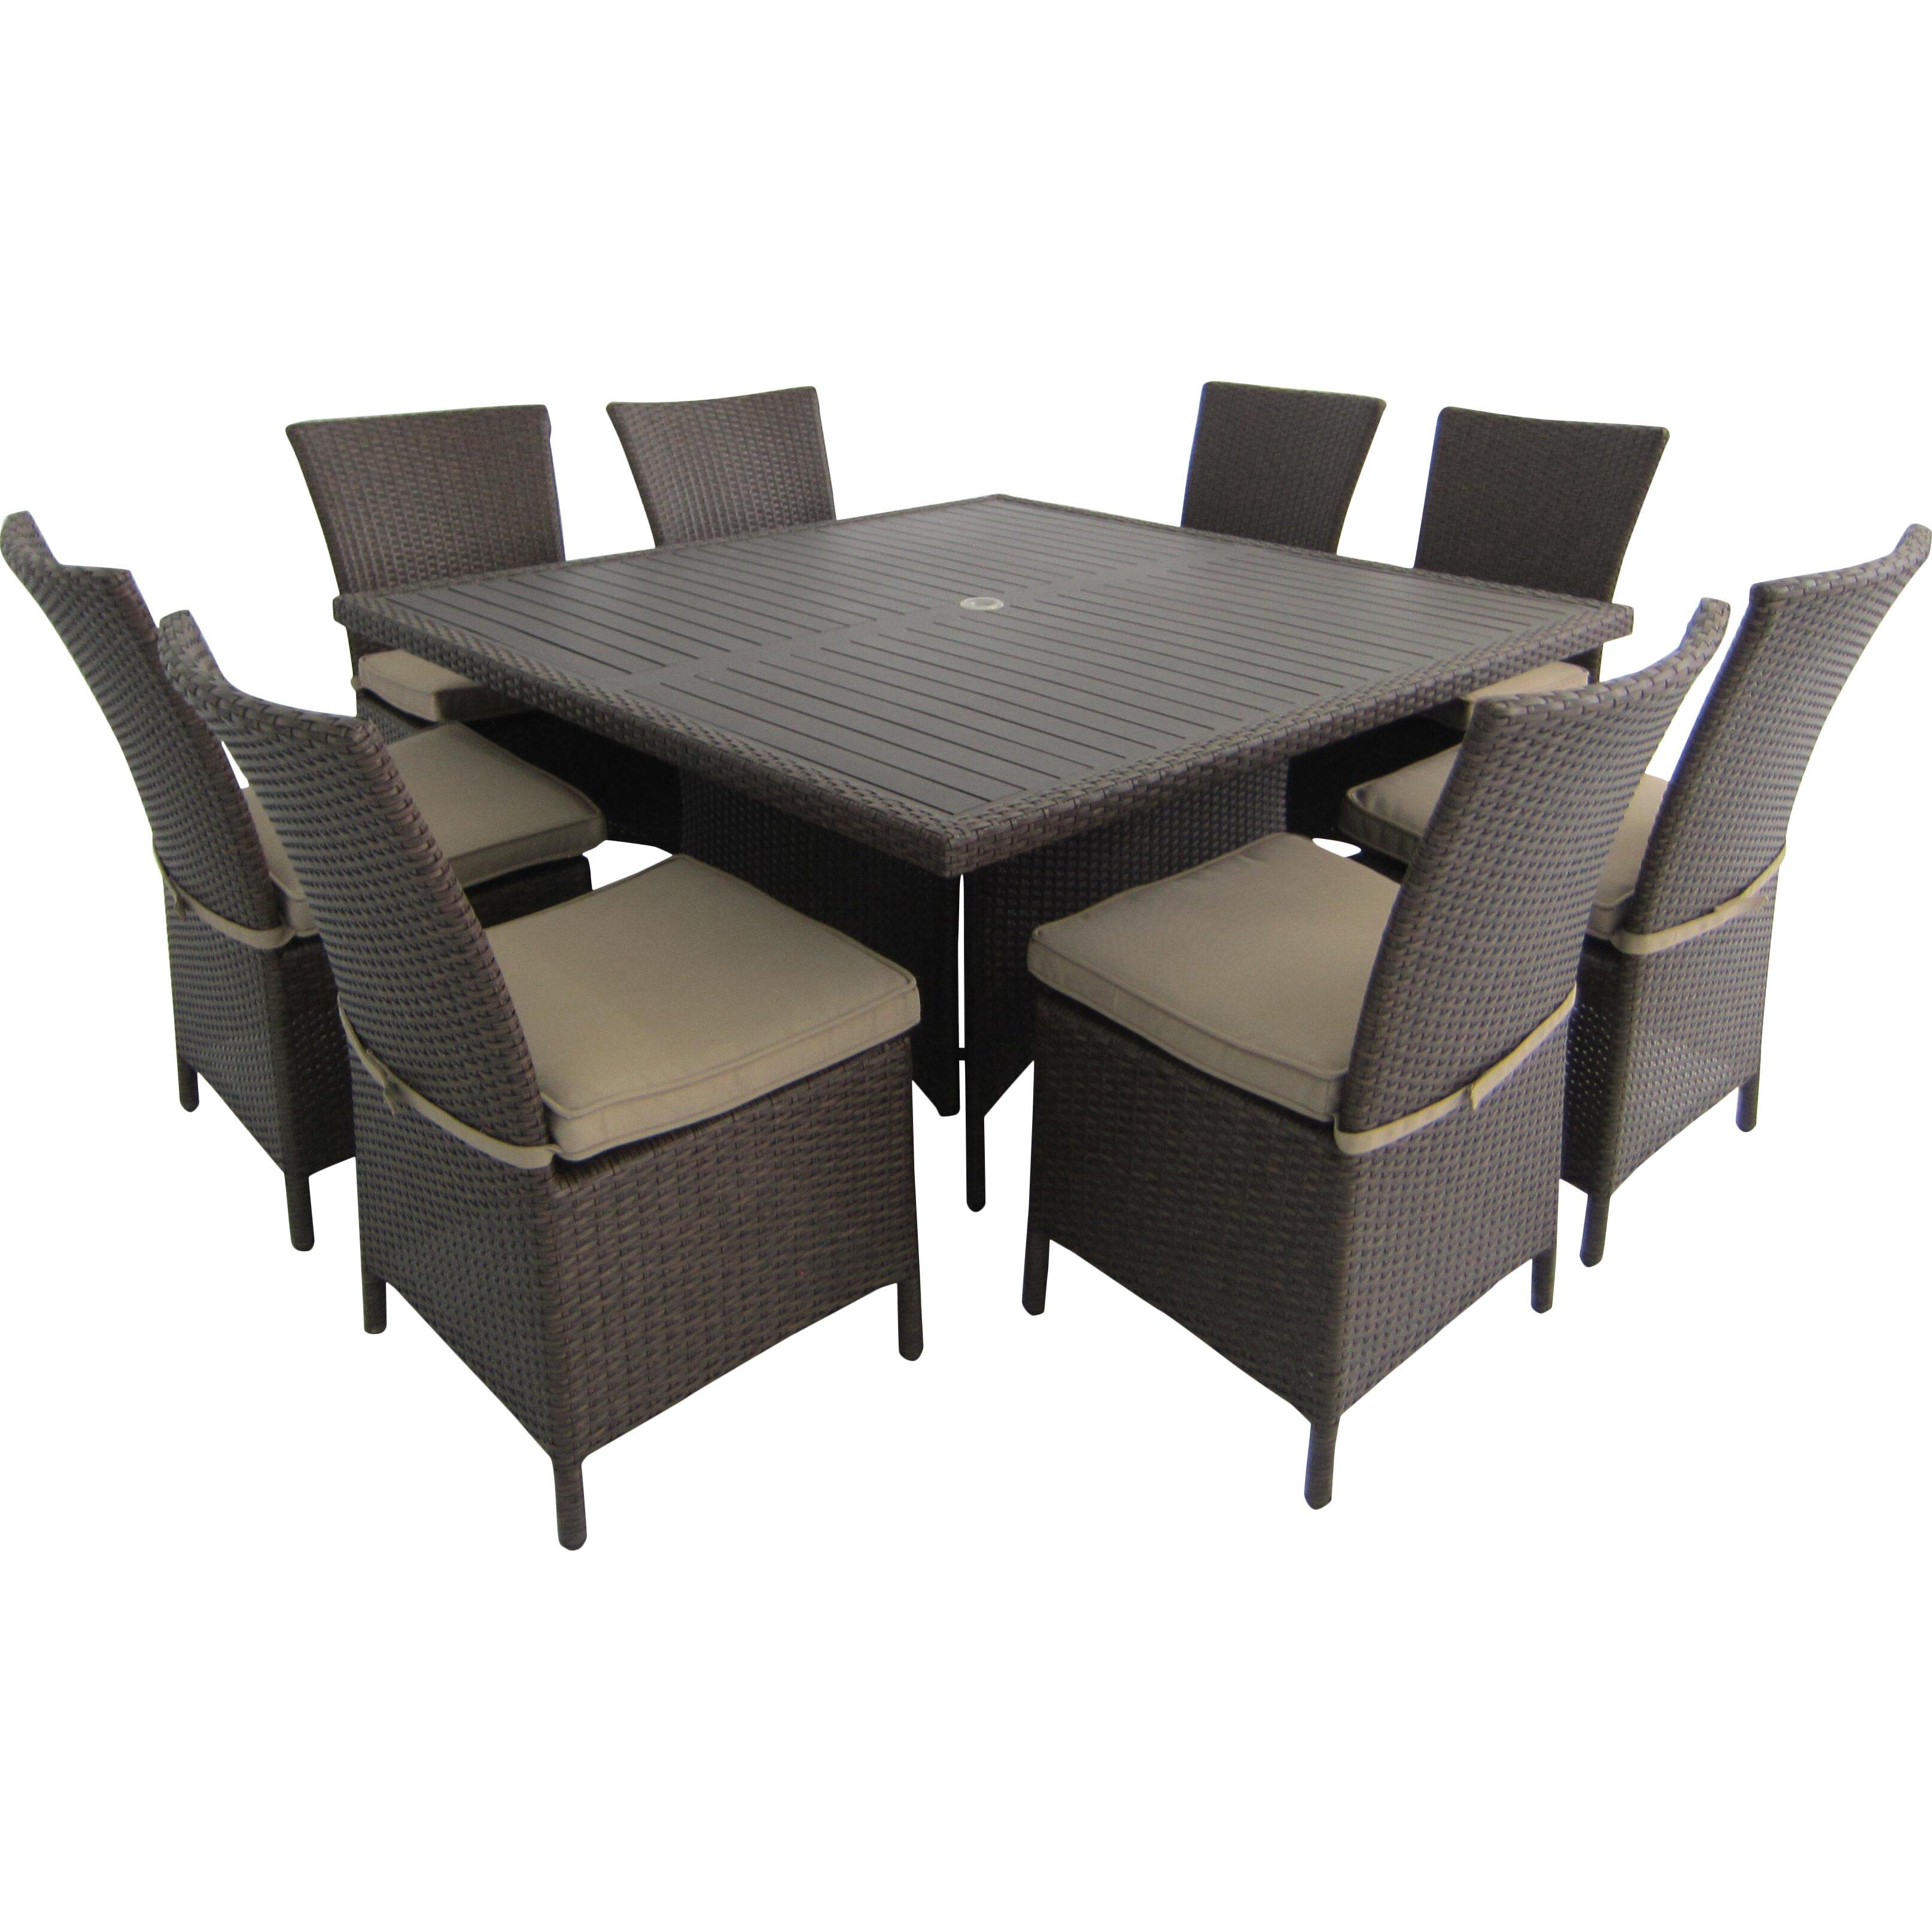 Costco Ca Dining Room Chairs Tennsatcom .